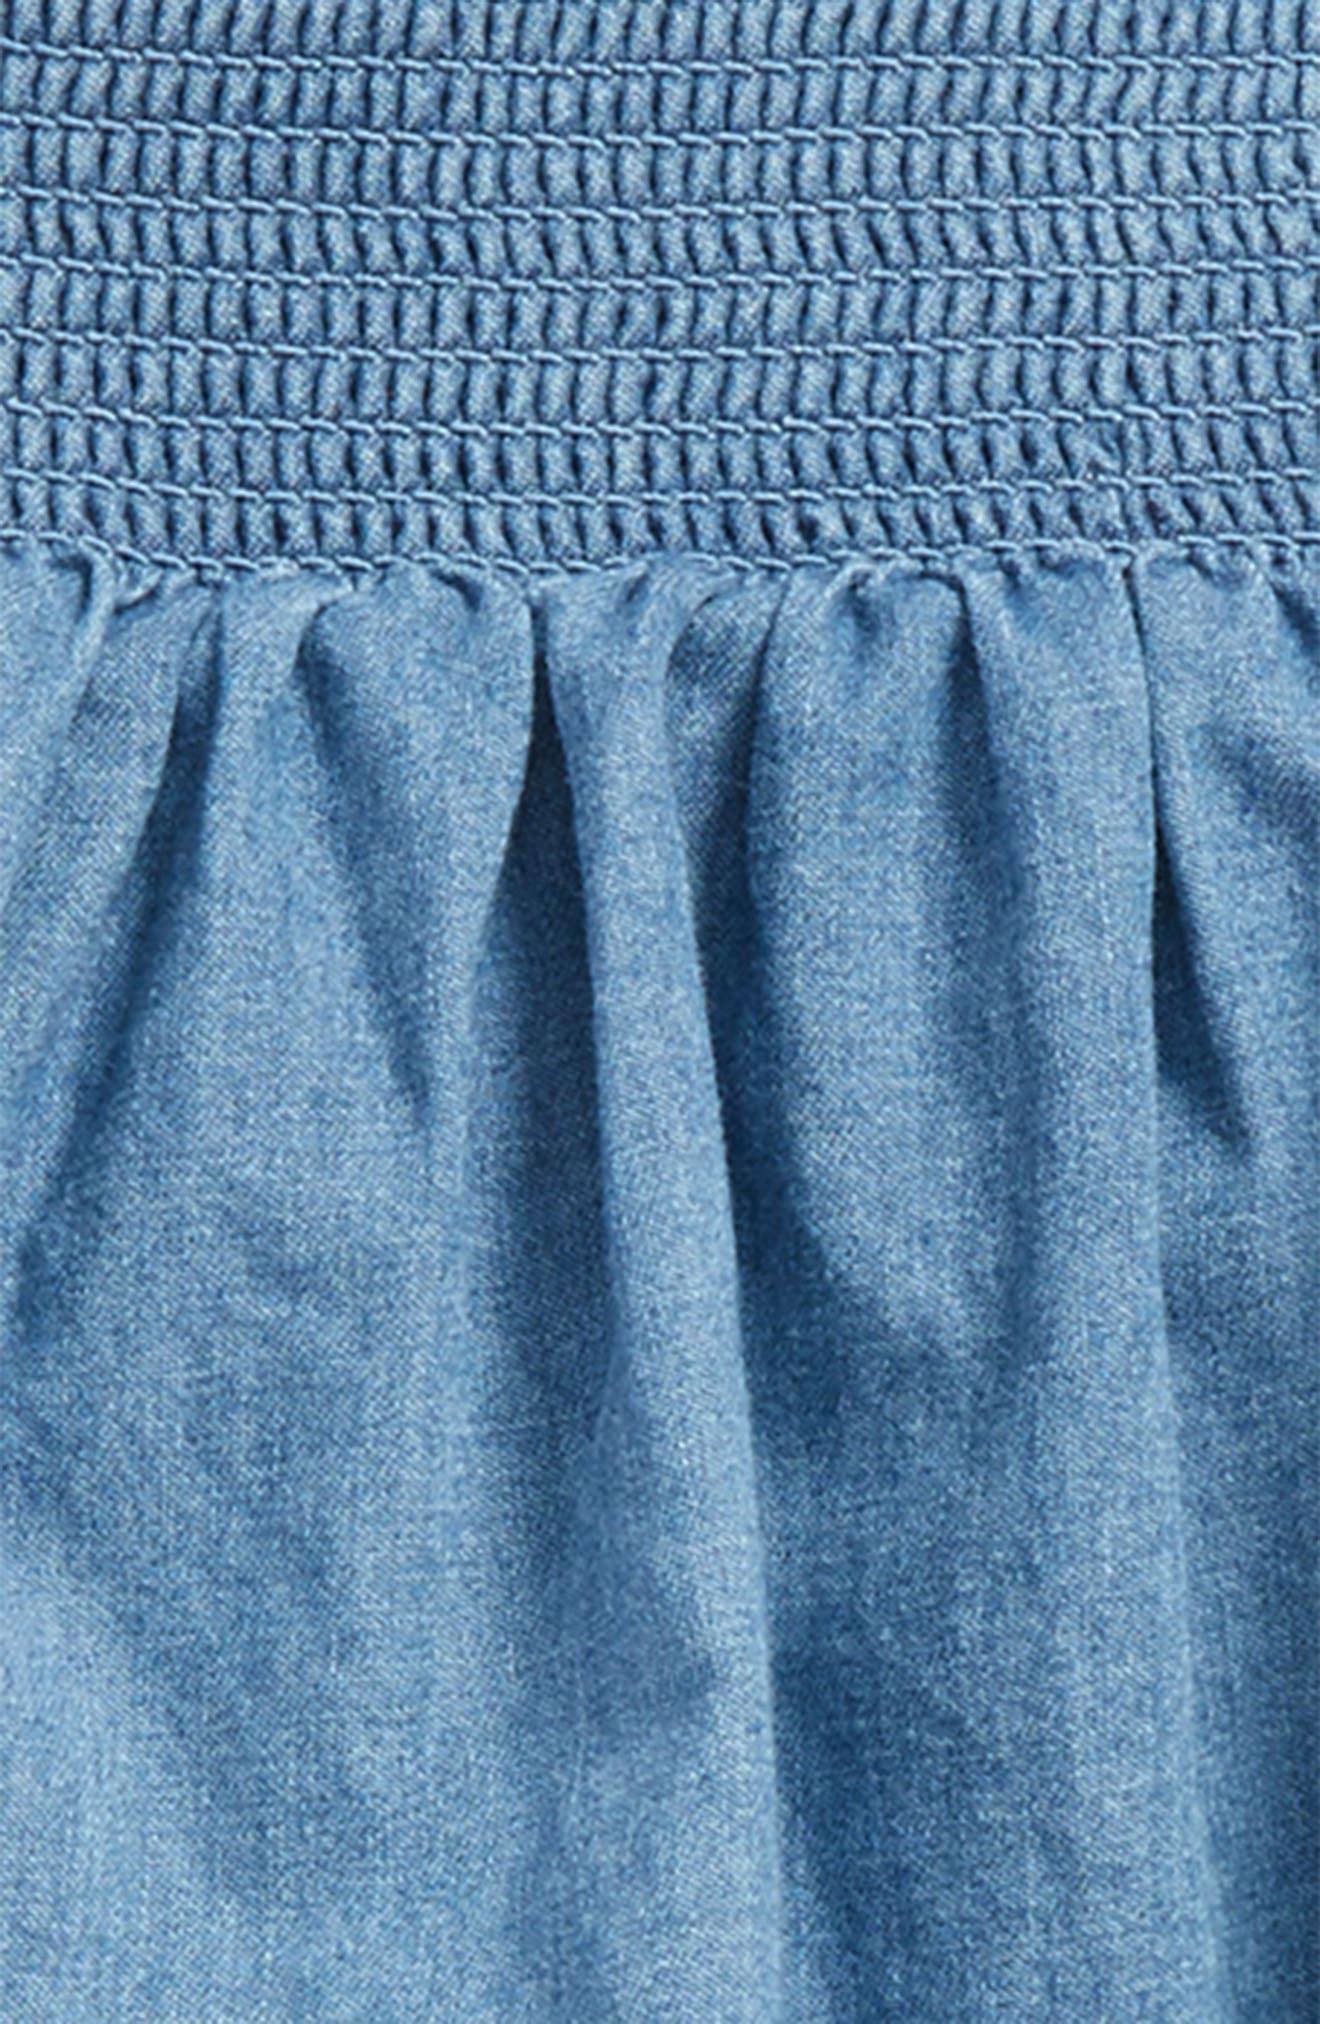 Ruffle Denim Skirt,                             Alternate thumbnail 2, color,                             Chambray Mch